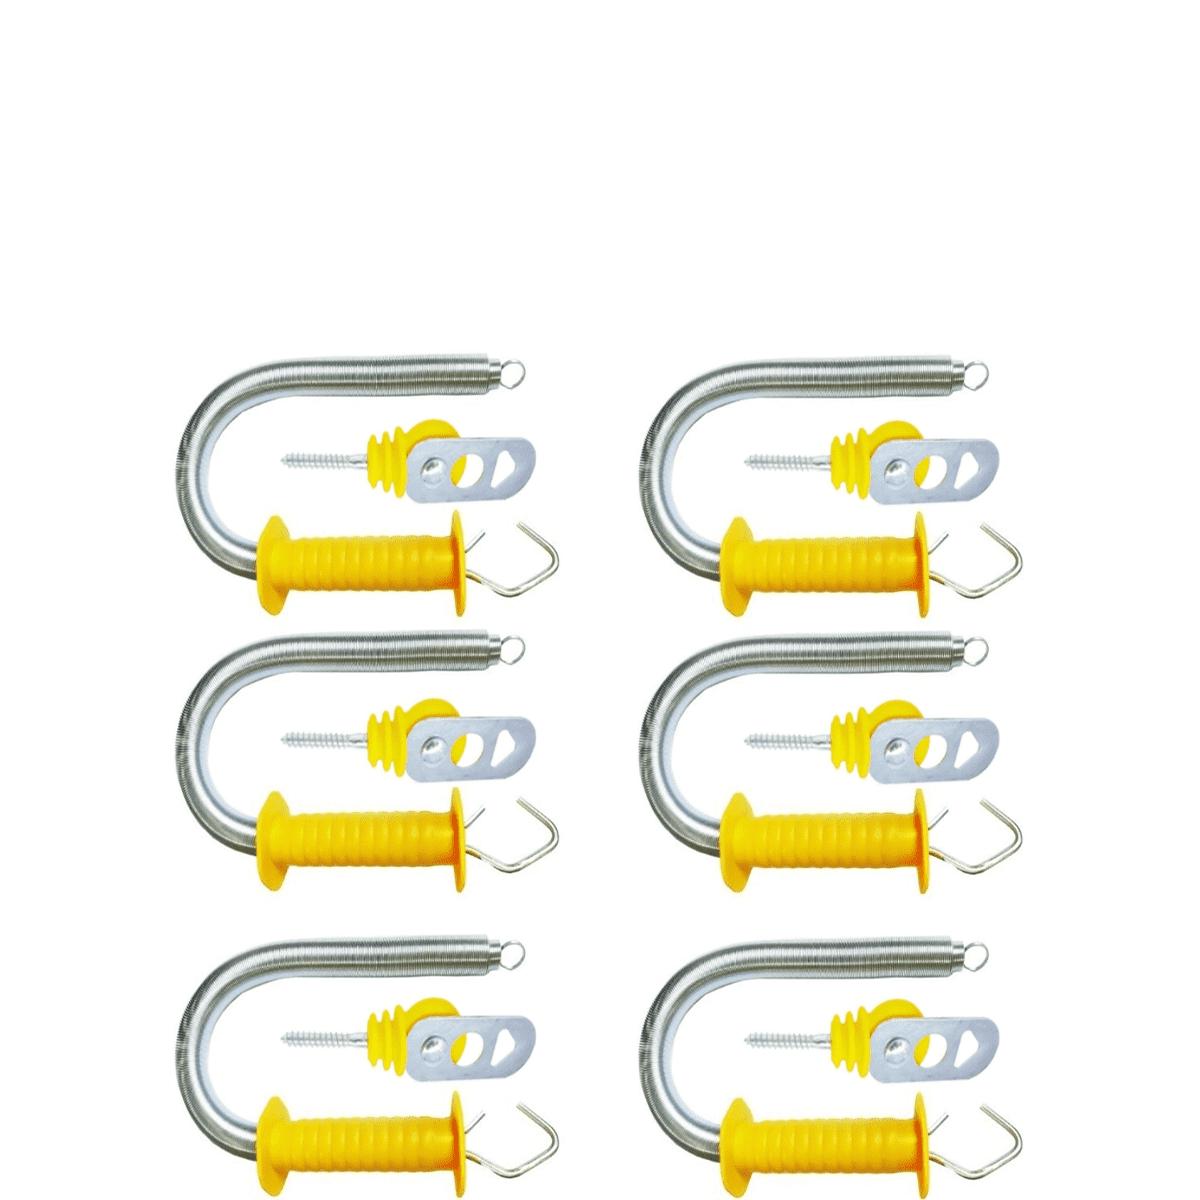 Kit 6 Porteiras Mola Externa Cerca Elétrica Rural 6 Batentes  - Ambientude Agro e Pet